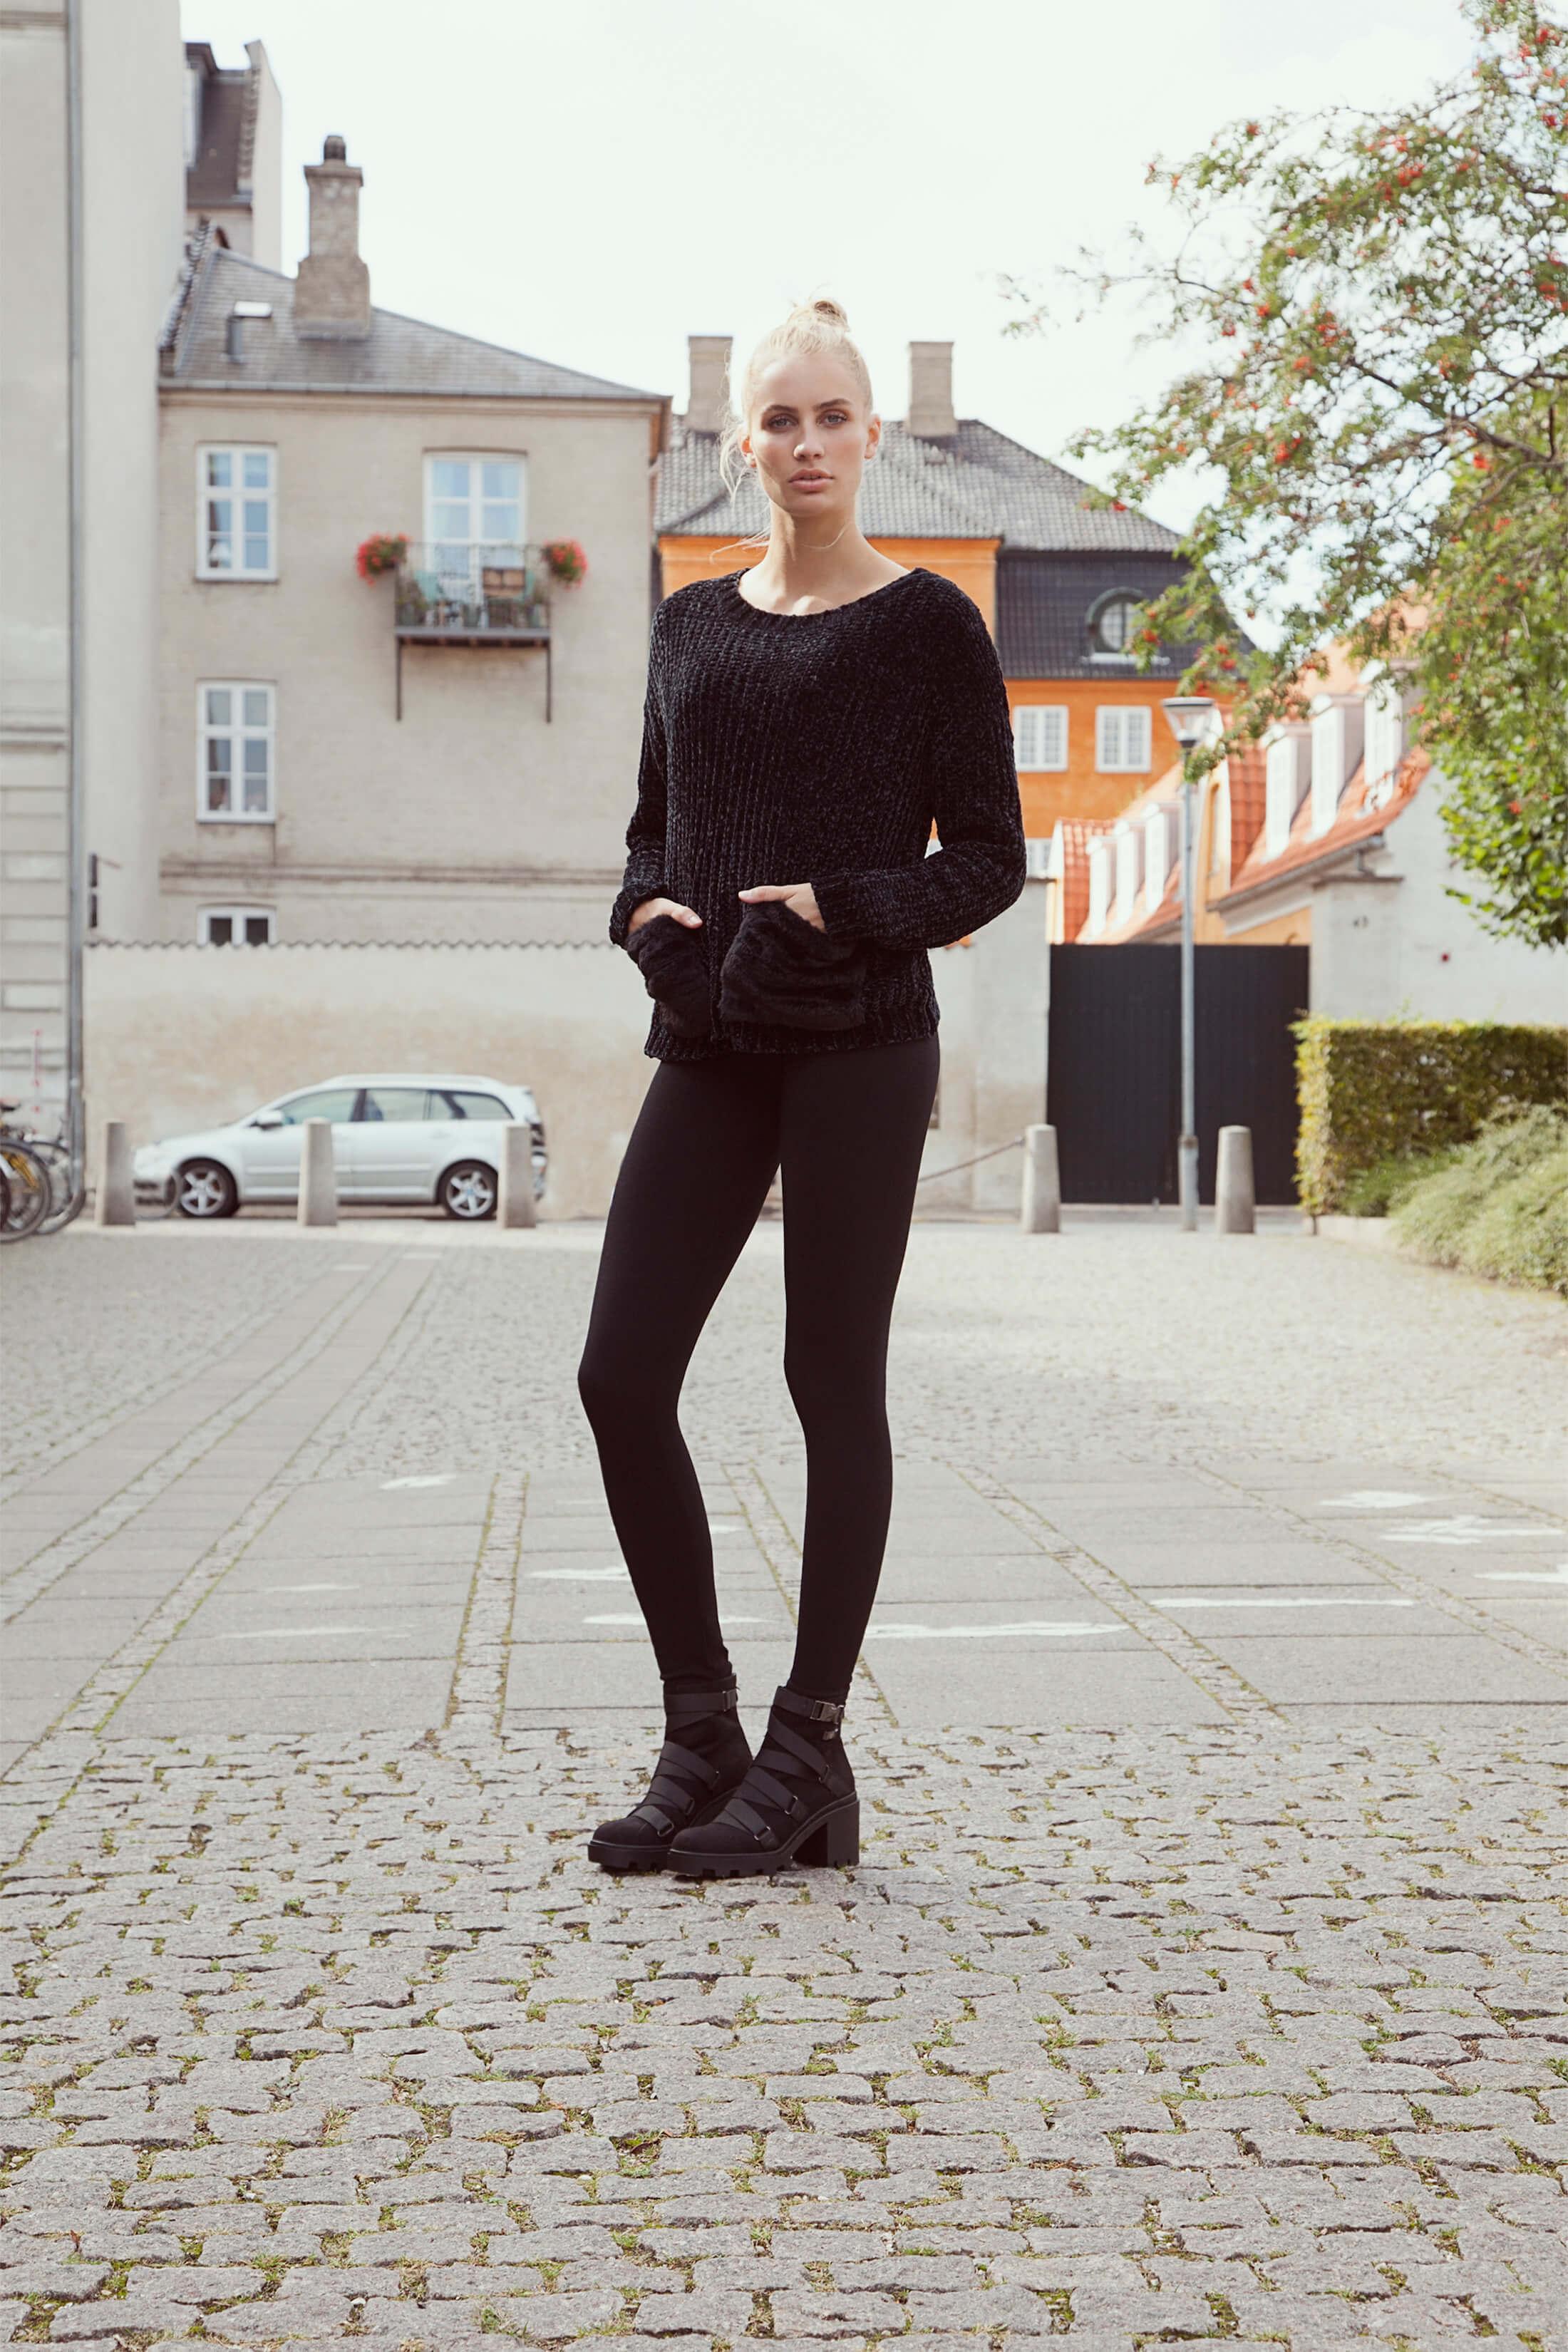 Soft pants, soft sweater – alt about softness!